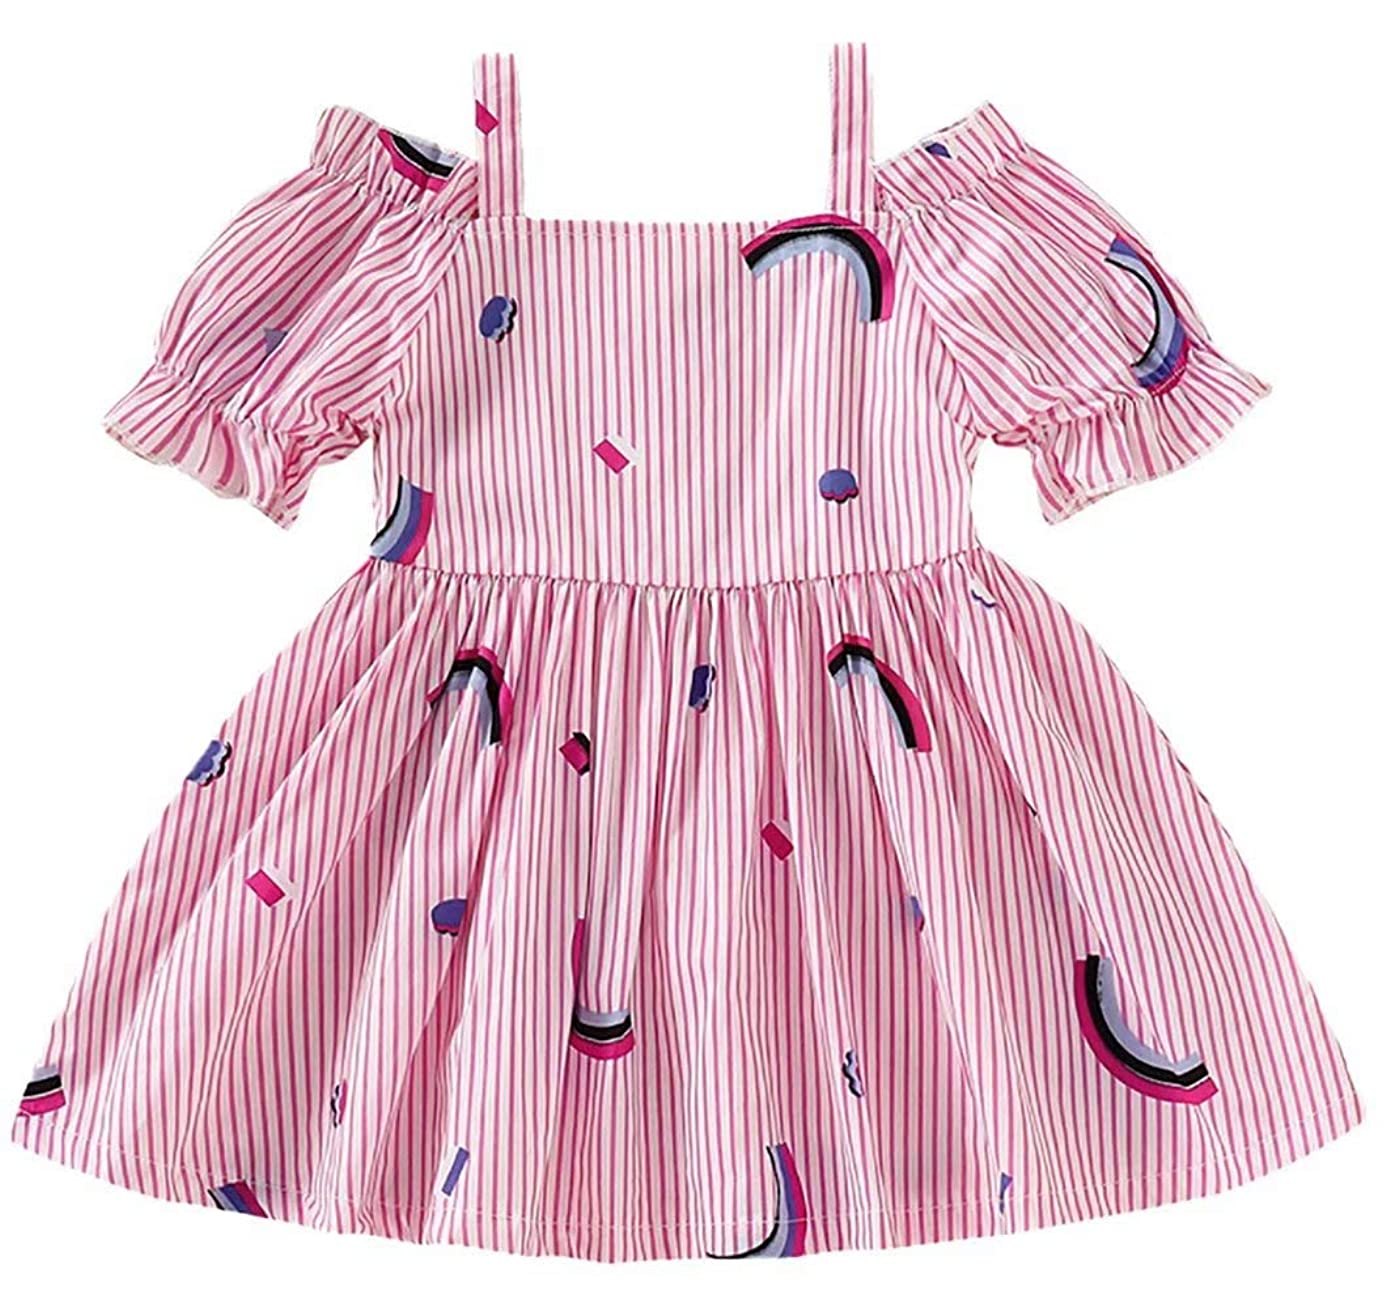 KIDDAD Toddler Baby Girls Rainbow Print Striped Off Shoulder Strap Dress Summer One Piece Party Dresses Sundress